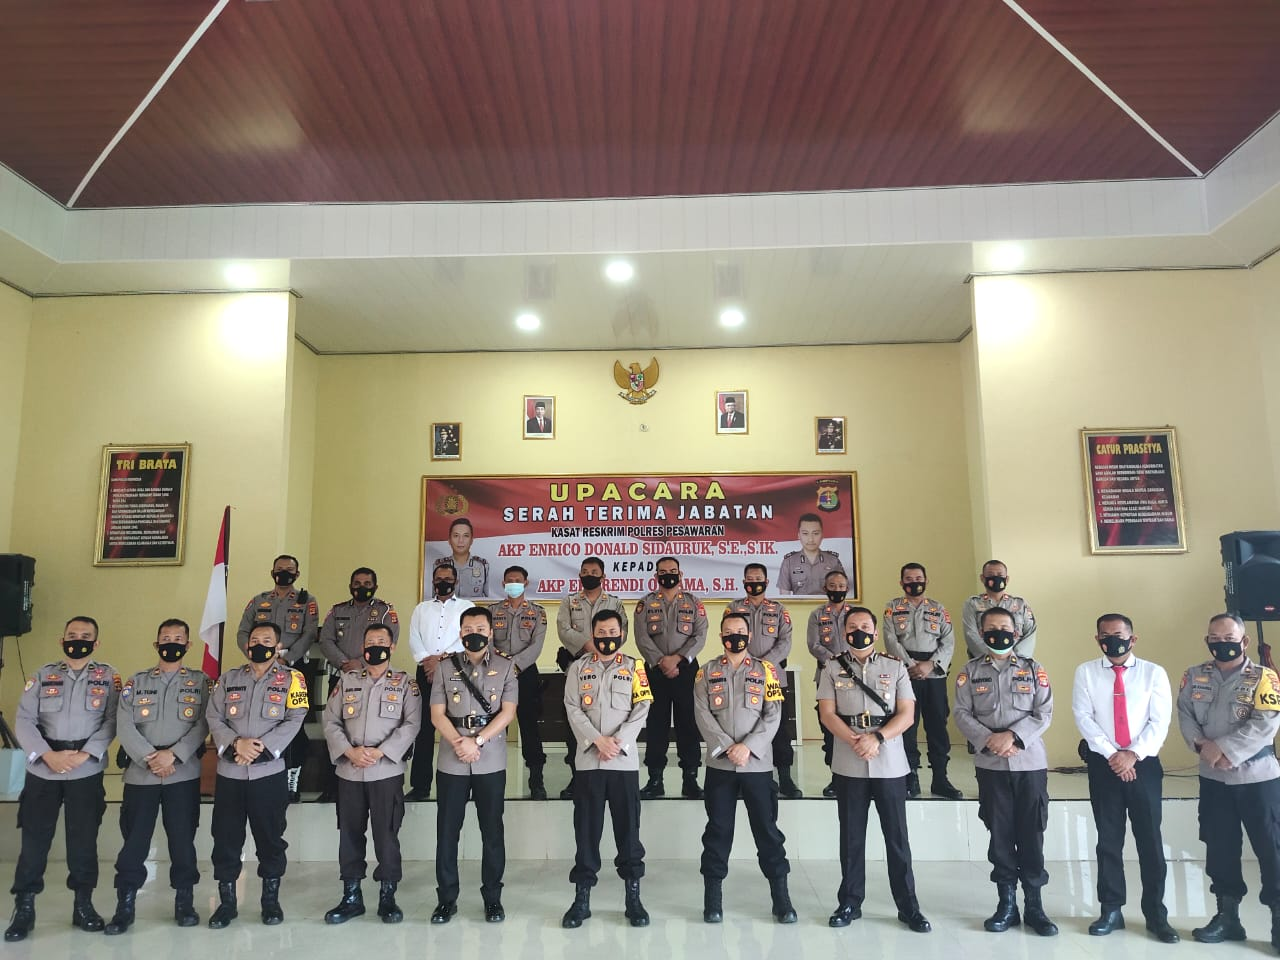 Kepolisian Resor Pesawaran menggelar upacara serah terima jabatan (sertijab) Kasat Reskrim bertempat di Aula Pamor Persada Polres Pesawaran